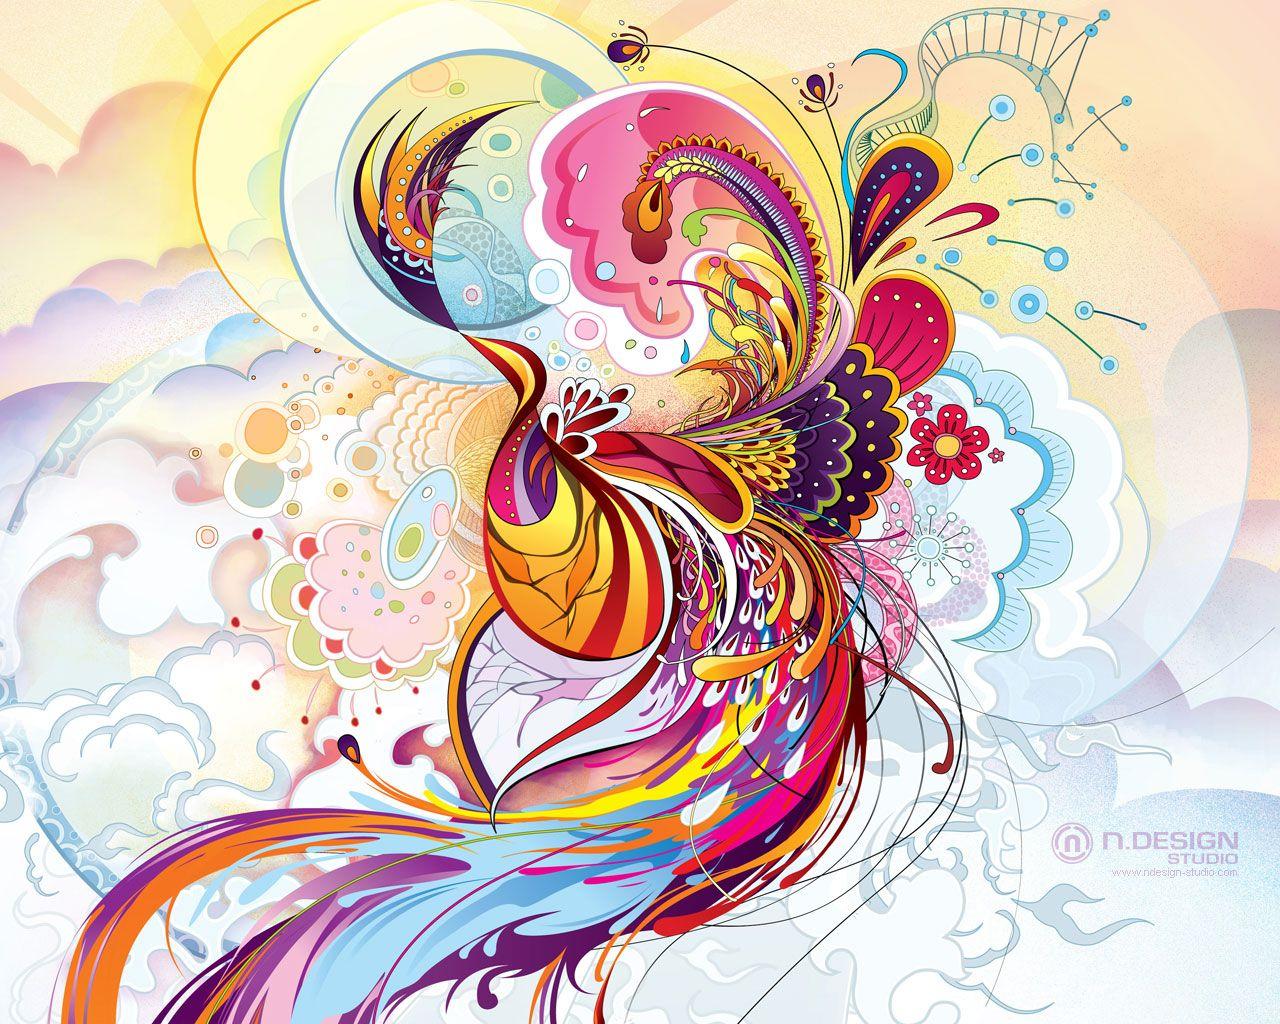 Abstract Peacock Bird Art Wallpaper By N Design